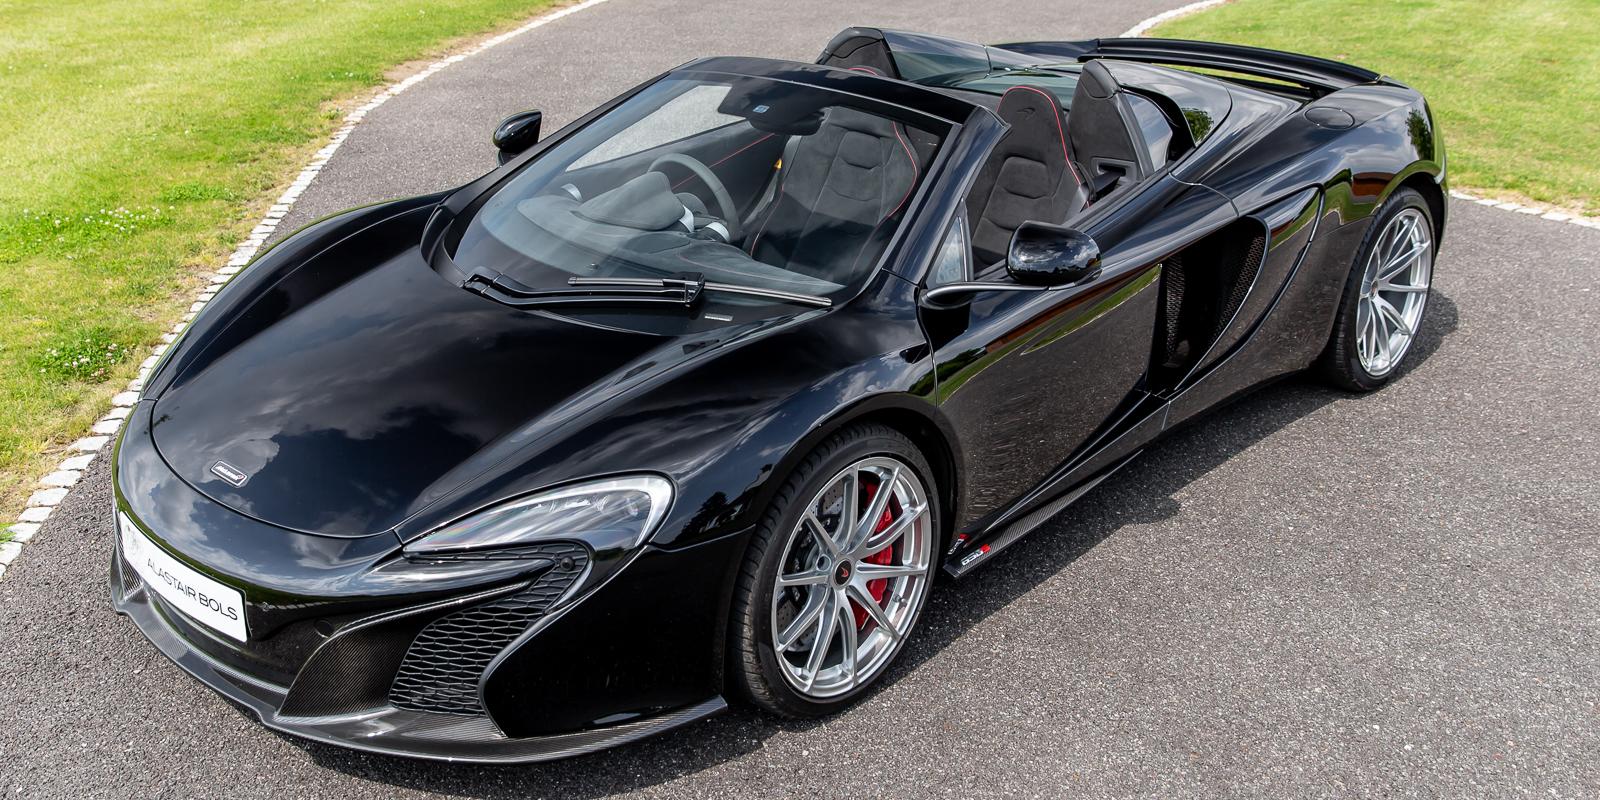 McLaren 650S Spider in Carbon Black